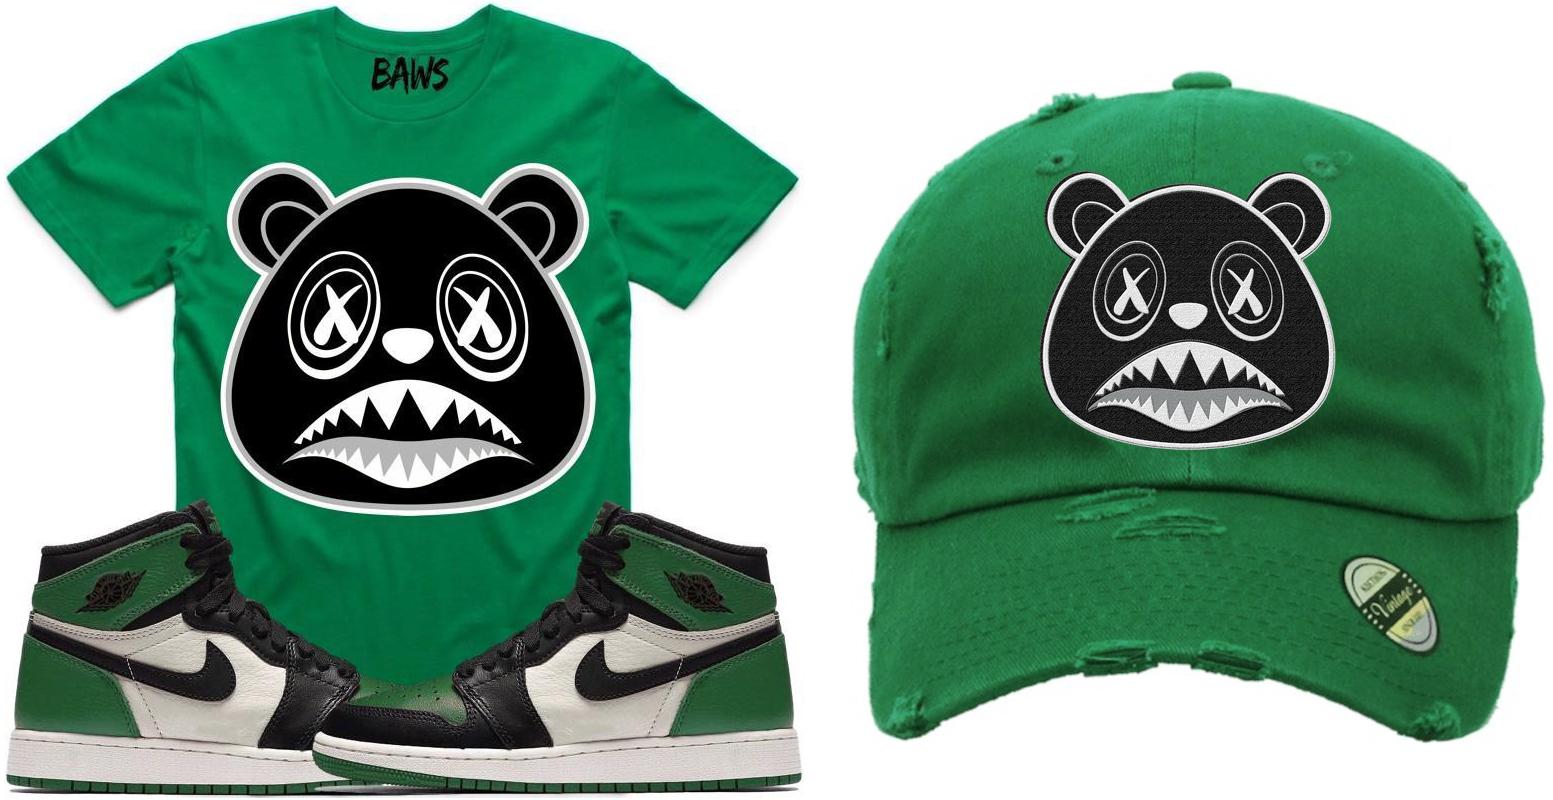 jordan-1-pine-green-sneaker-clothing-match-baws